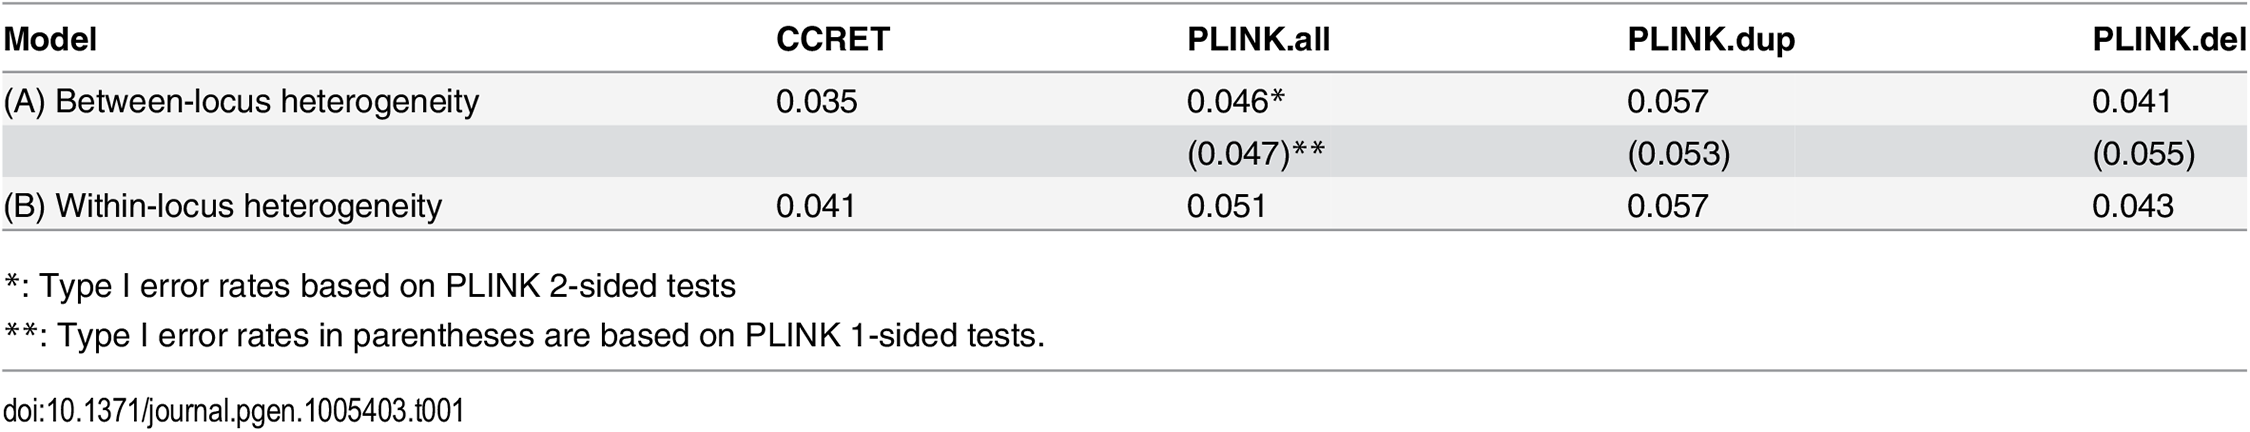 Type I error rates for evaluating dosage effects (nominal alpha = 0.05).